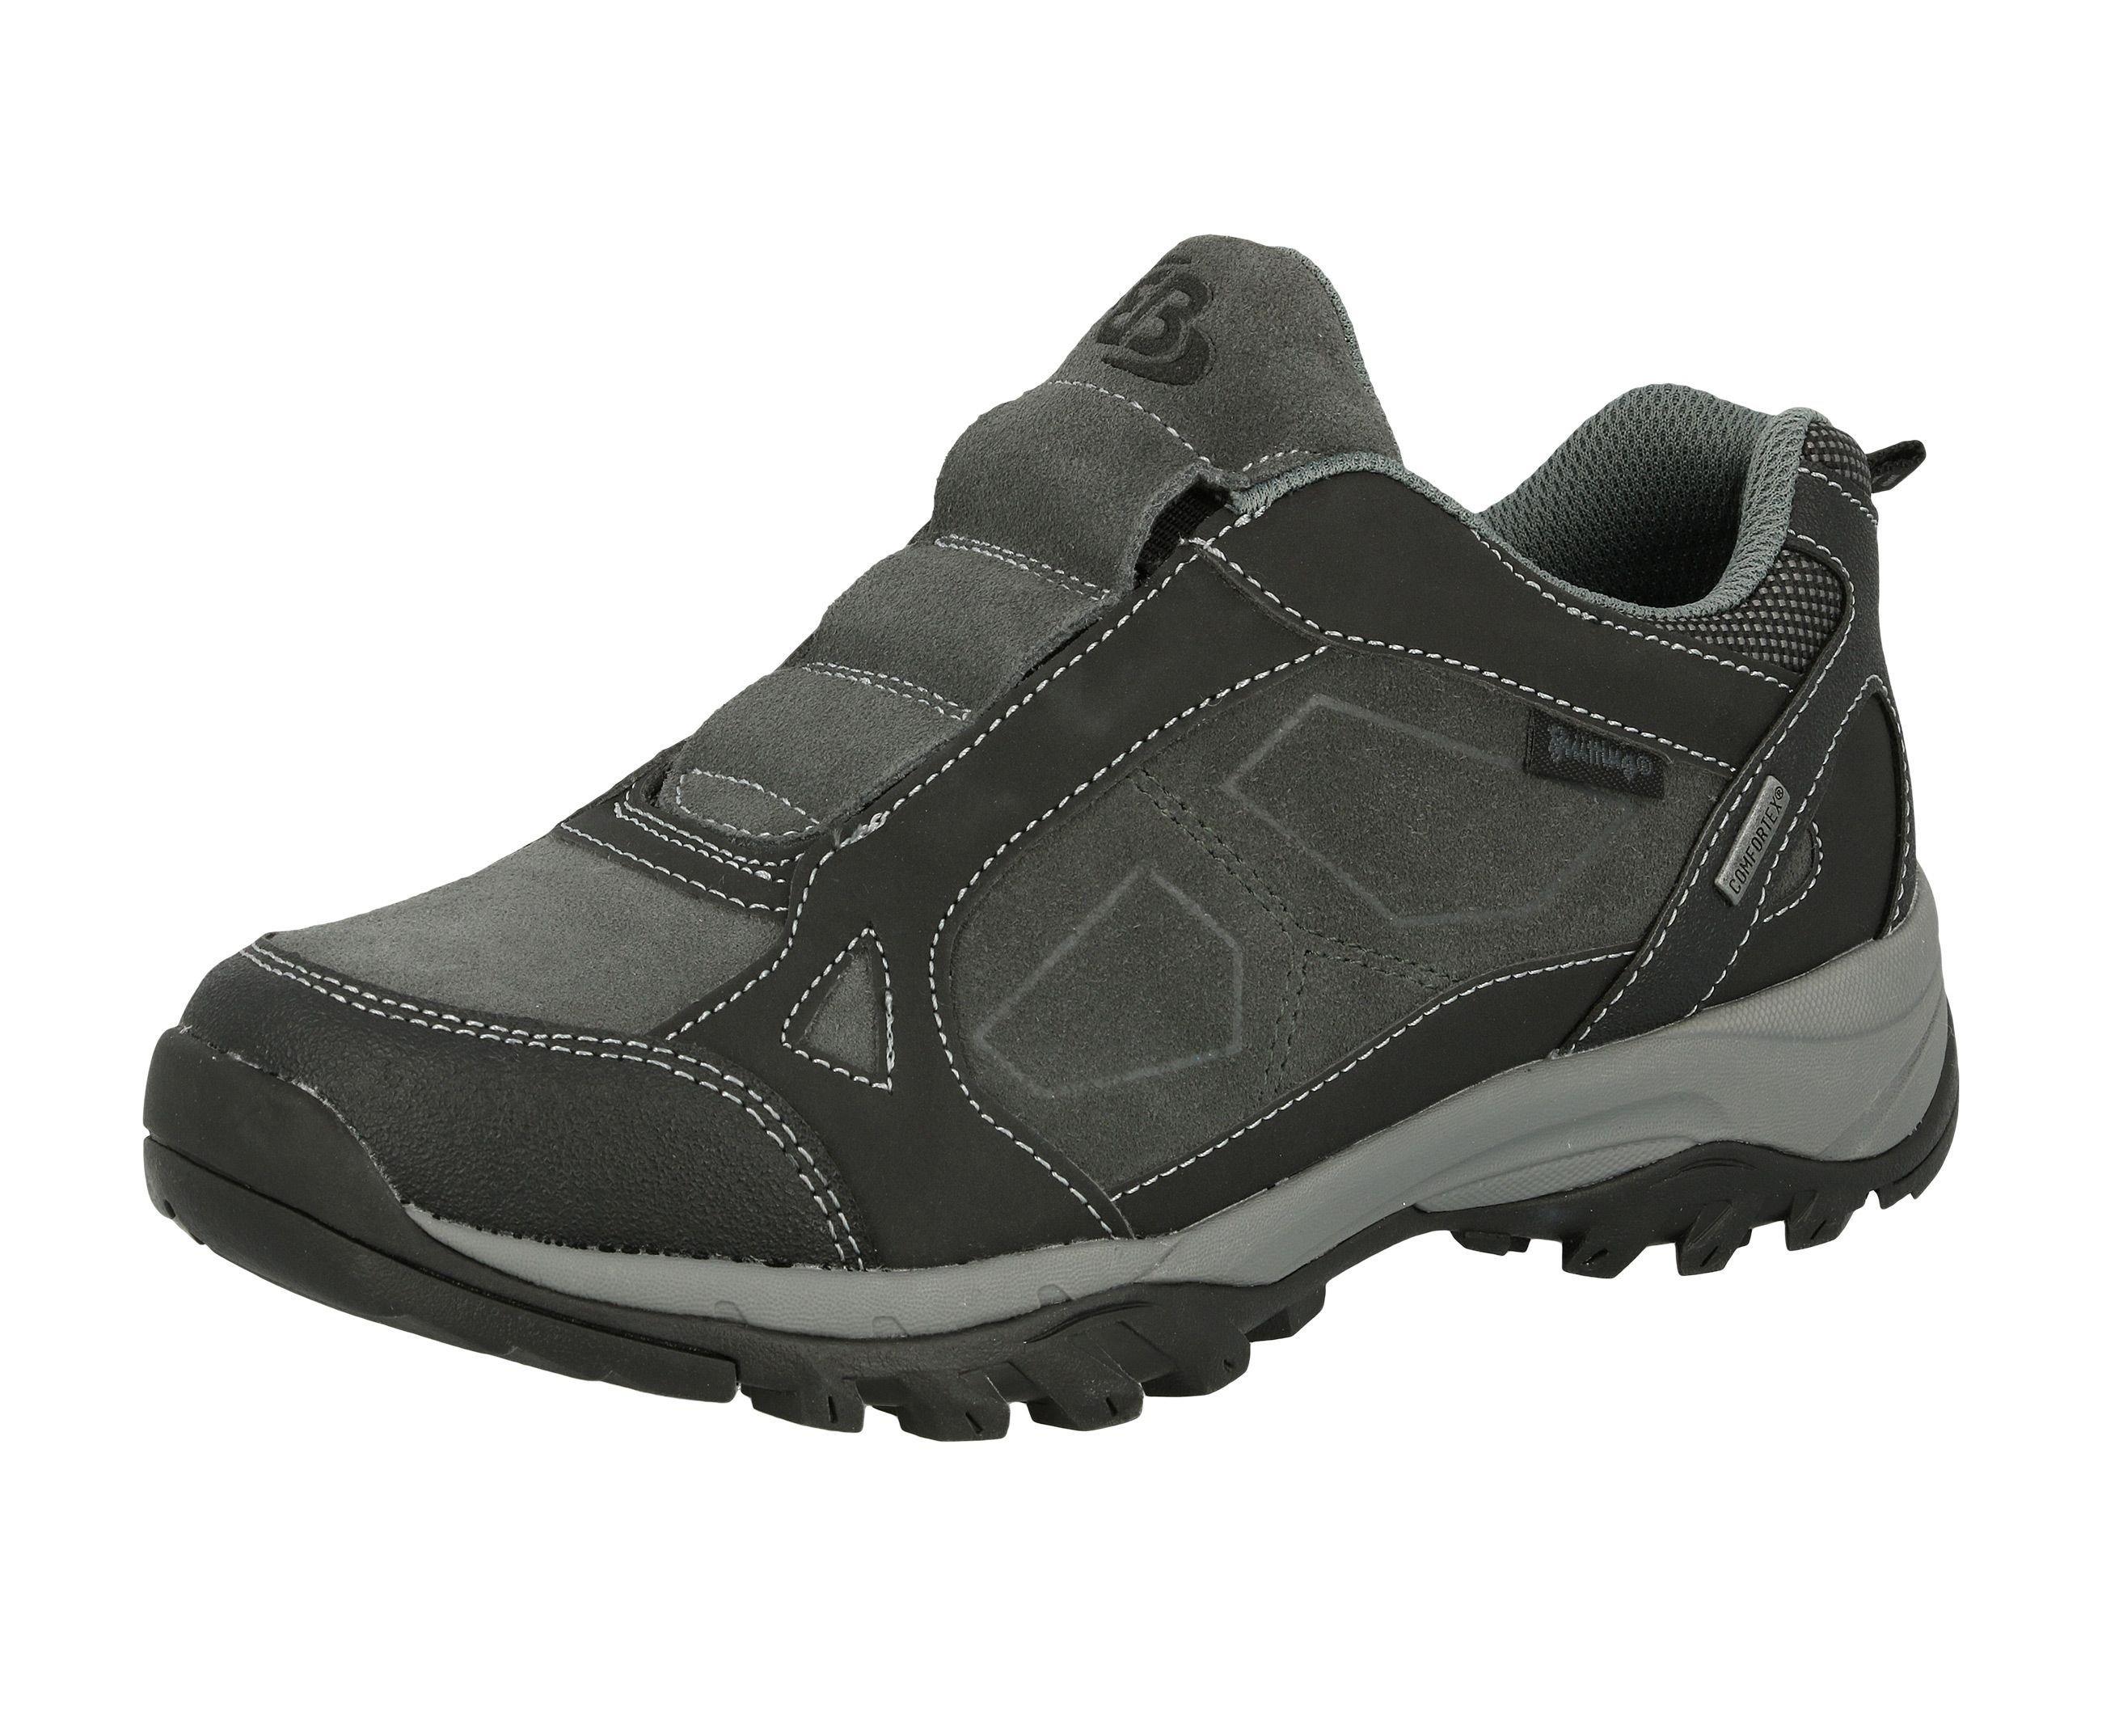 BRÜTTING outdoorschoenen Akron Slipper bij OTTO online kopen